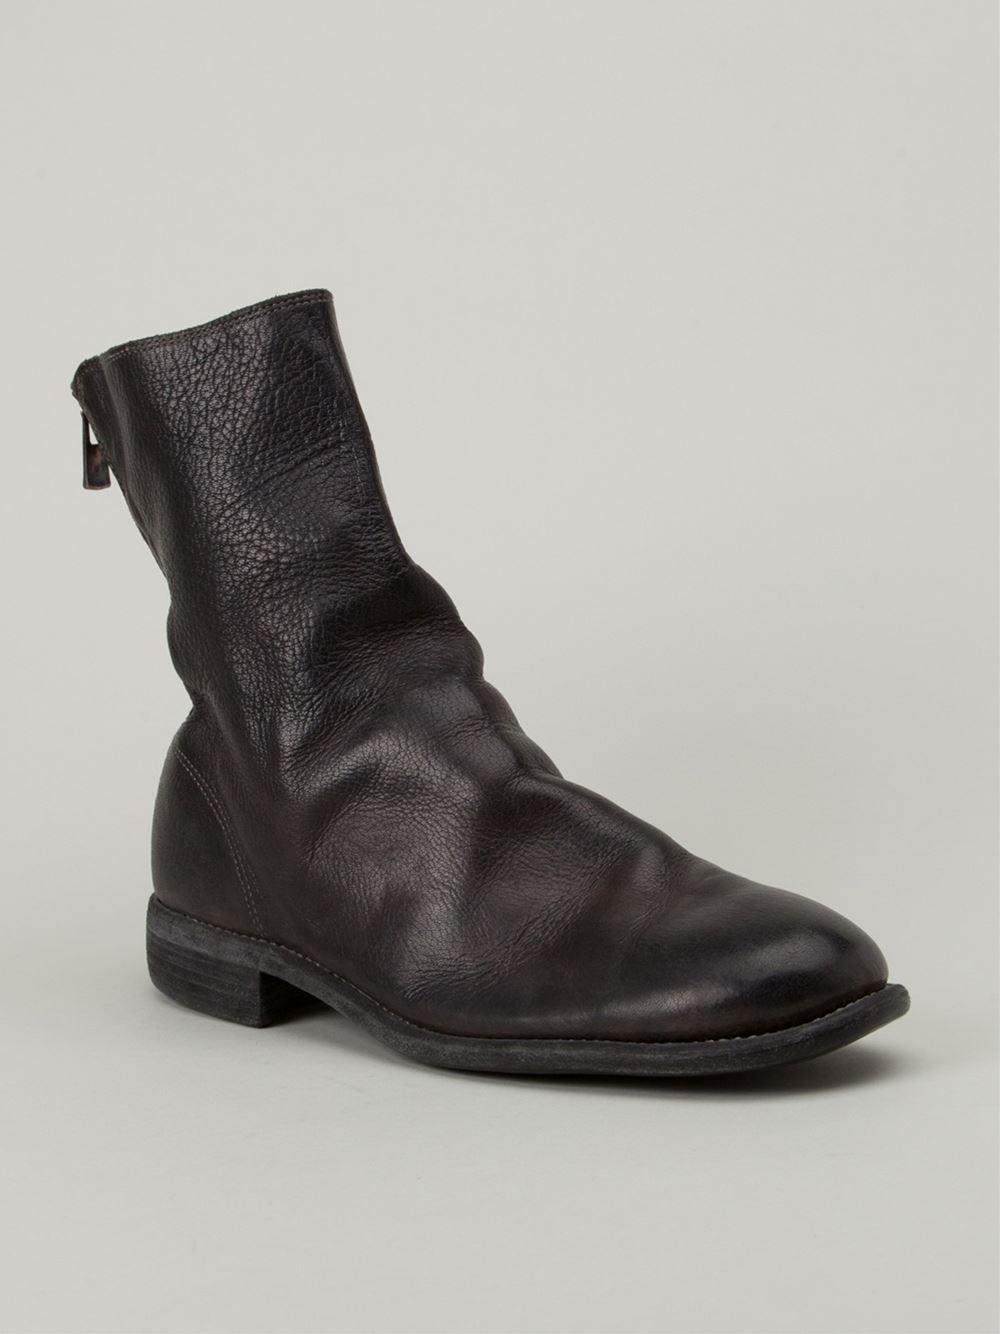 In For Boots Lyst Men Back Guidi Zip Black xnCnwpqvtI